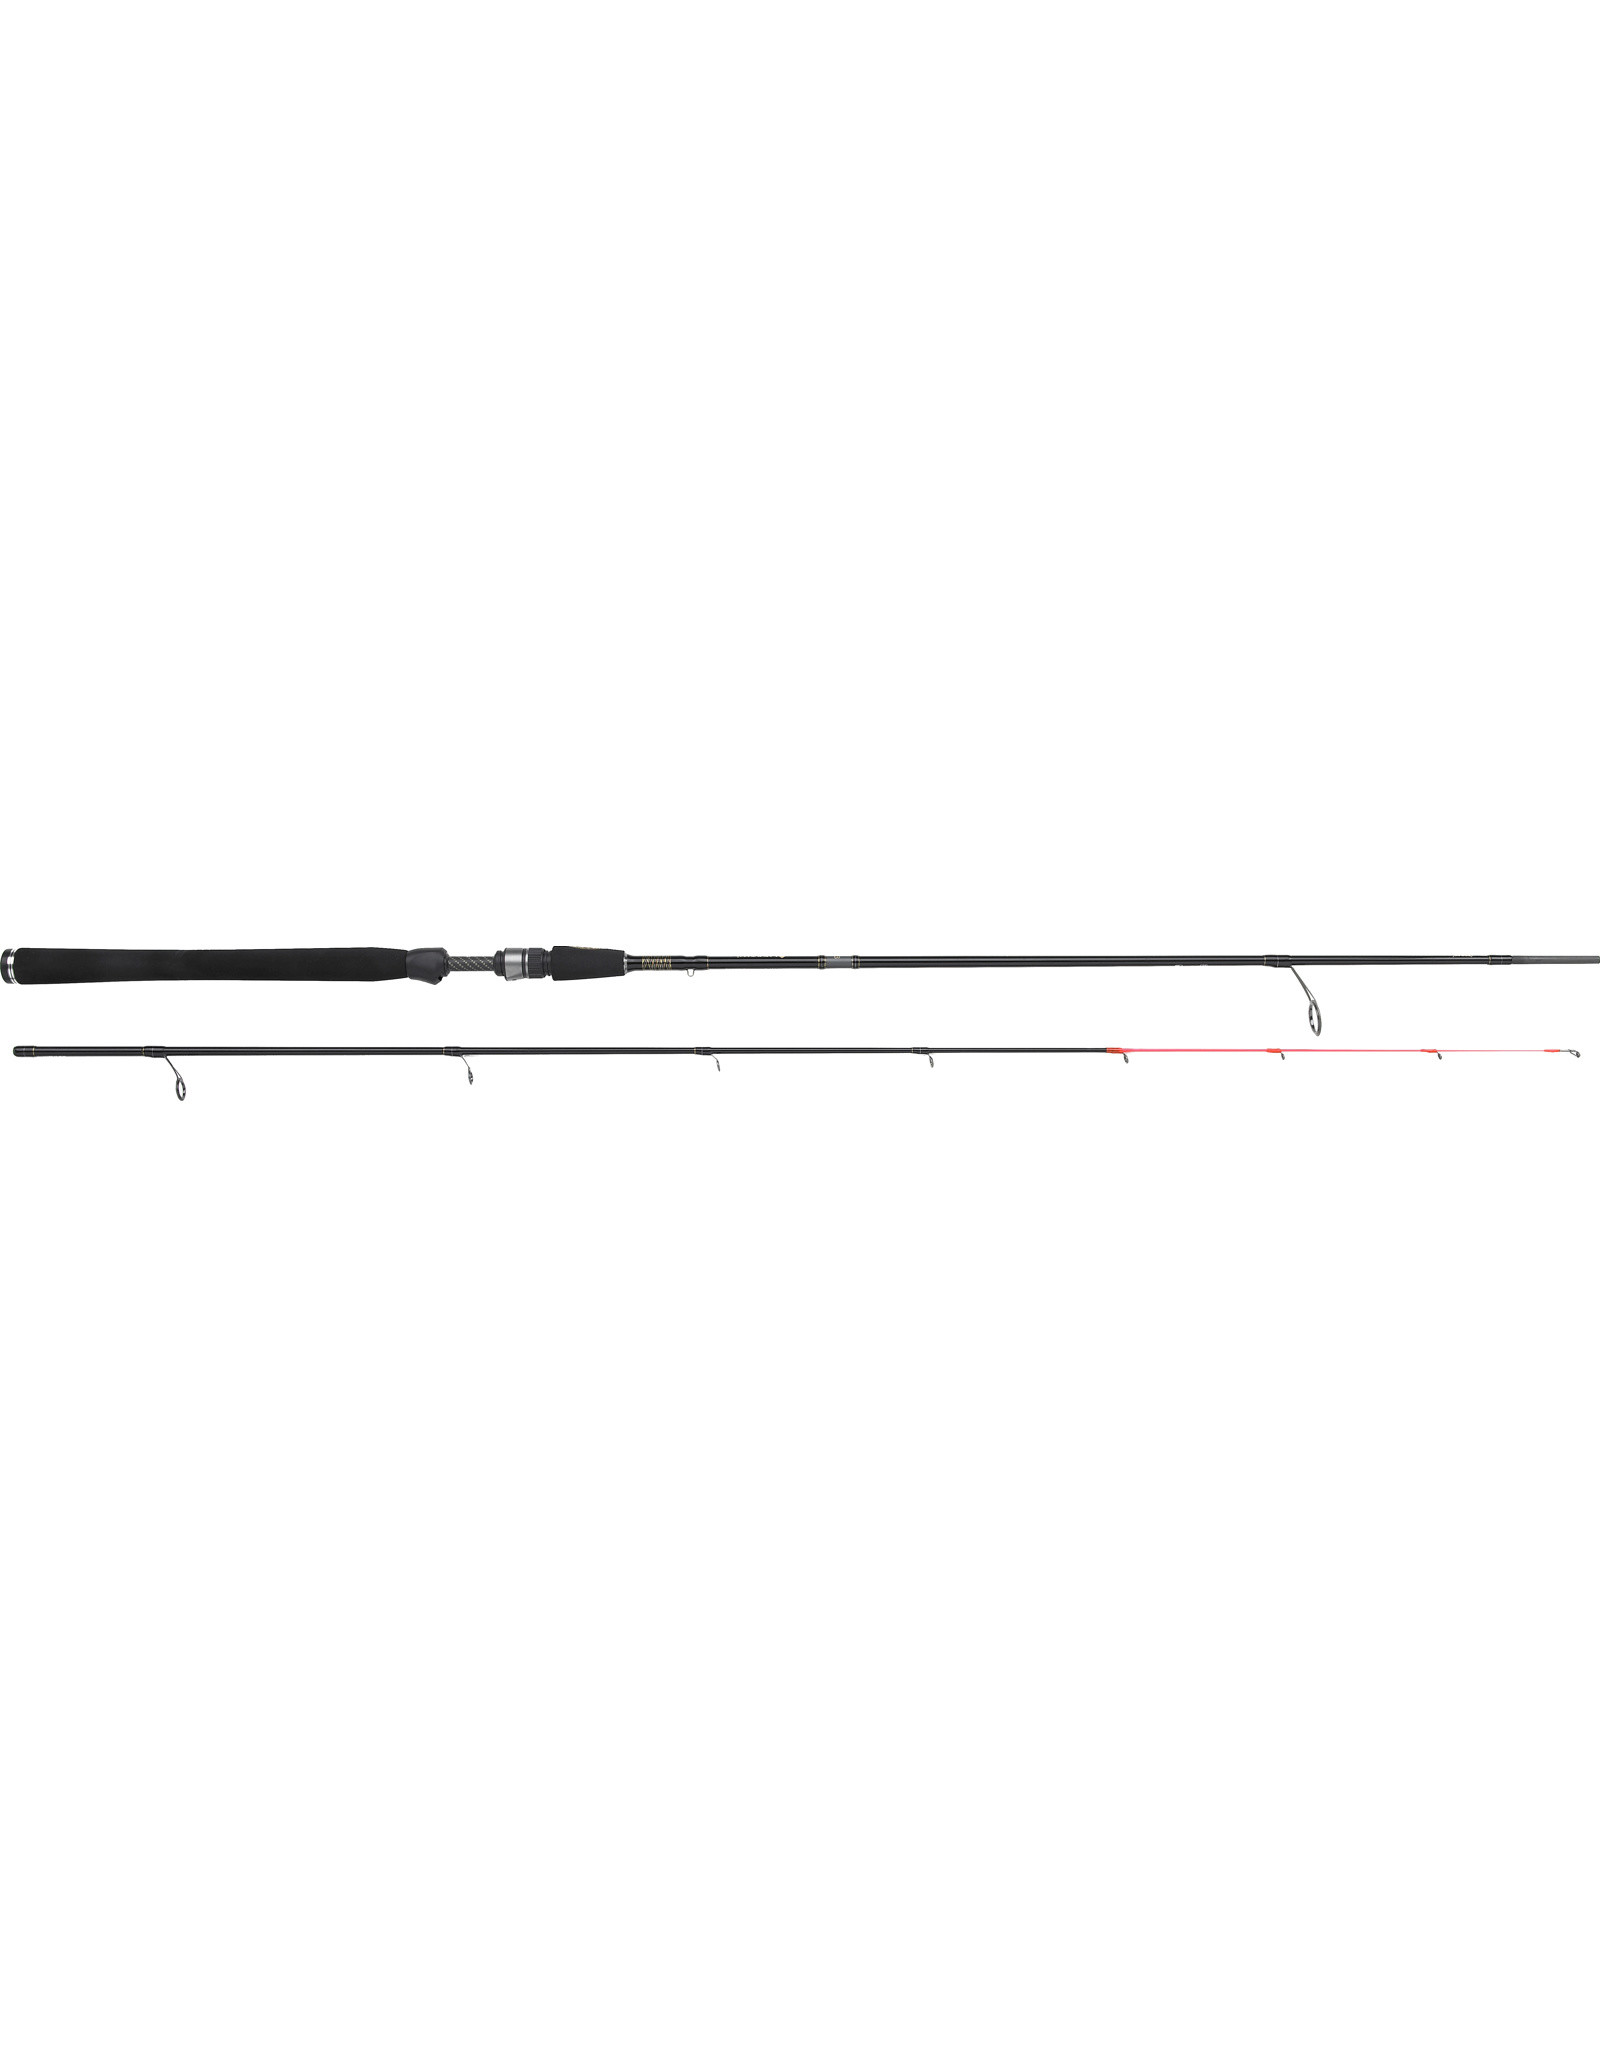 "Westin W3 Finesse Jig 8'3""/248 cm M 7-28 g 2 sec."